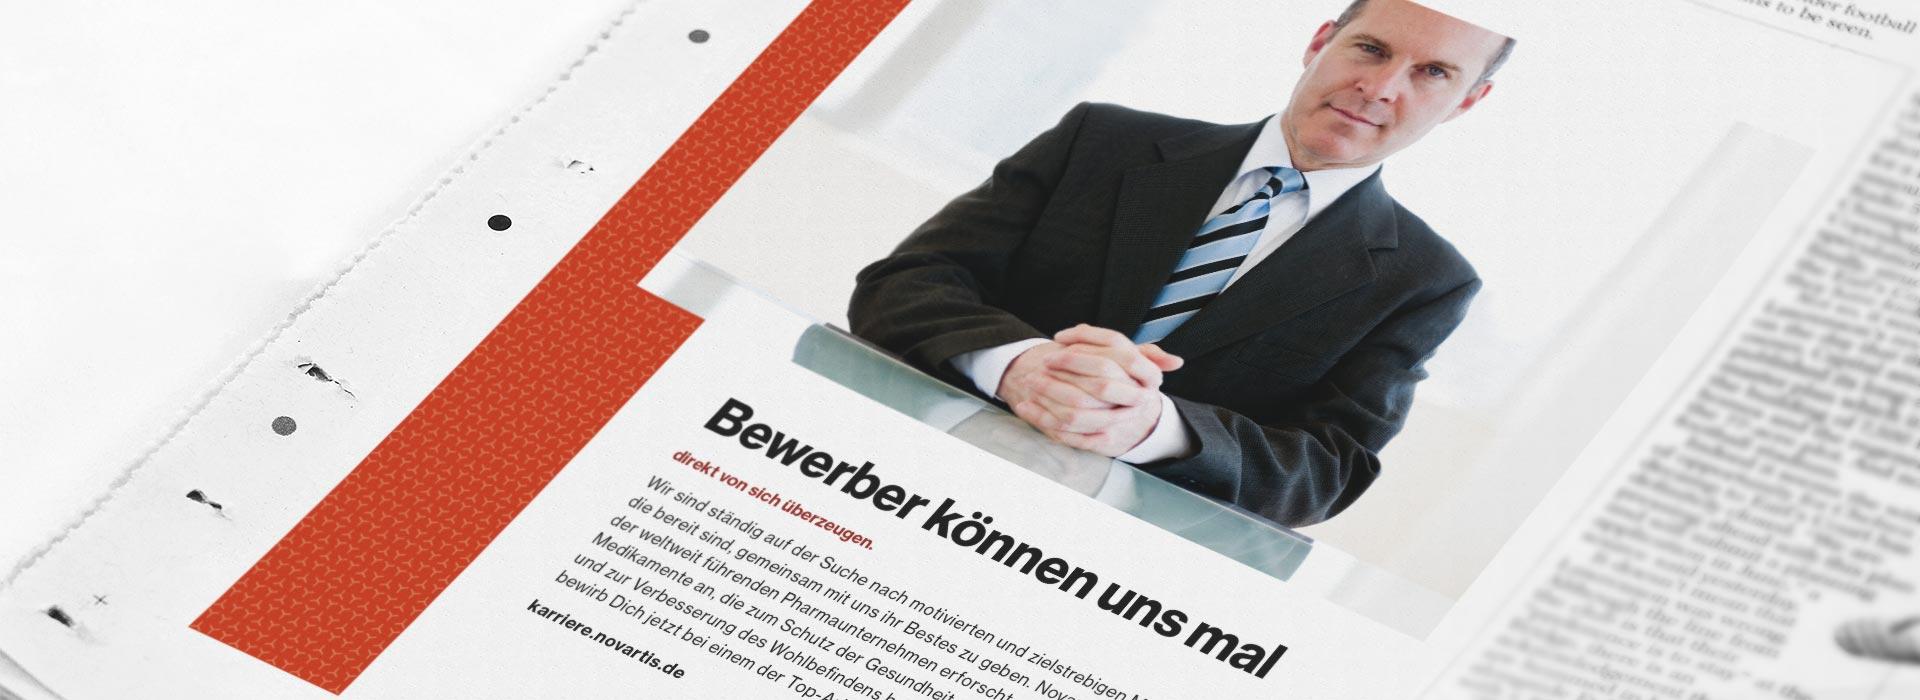 OPUS Marketing / Leistungen / Novartis / Employer Branding / Stellenausschreibung